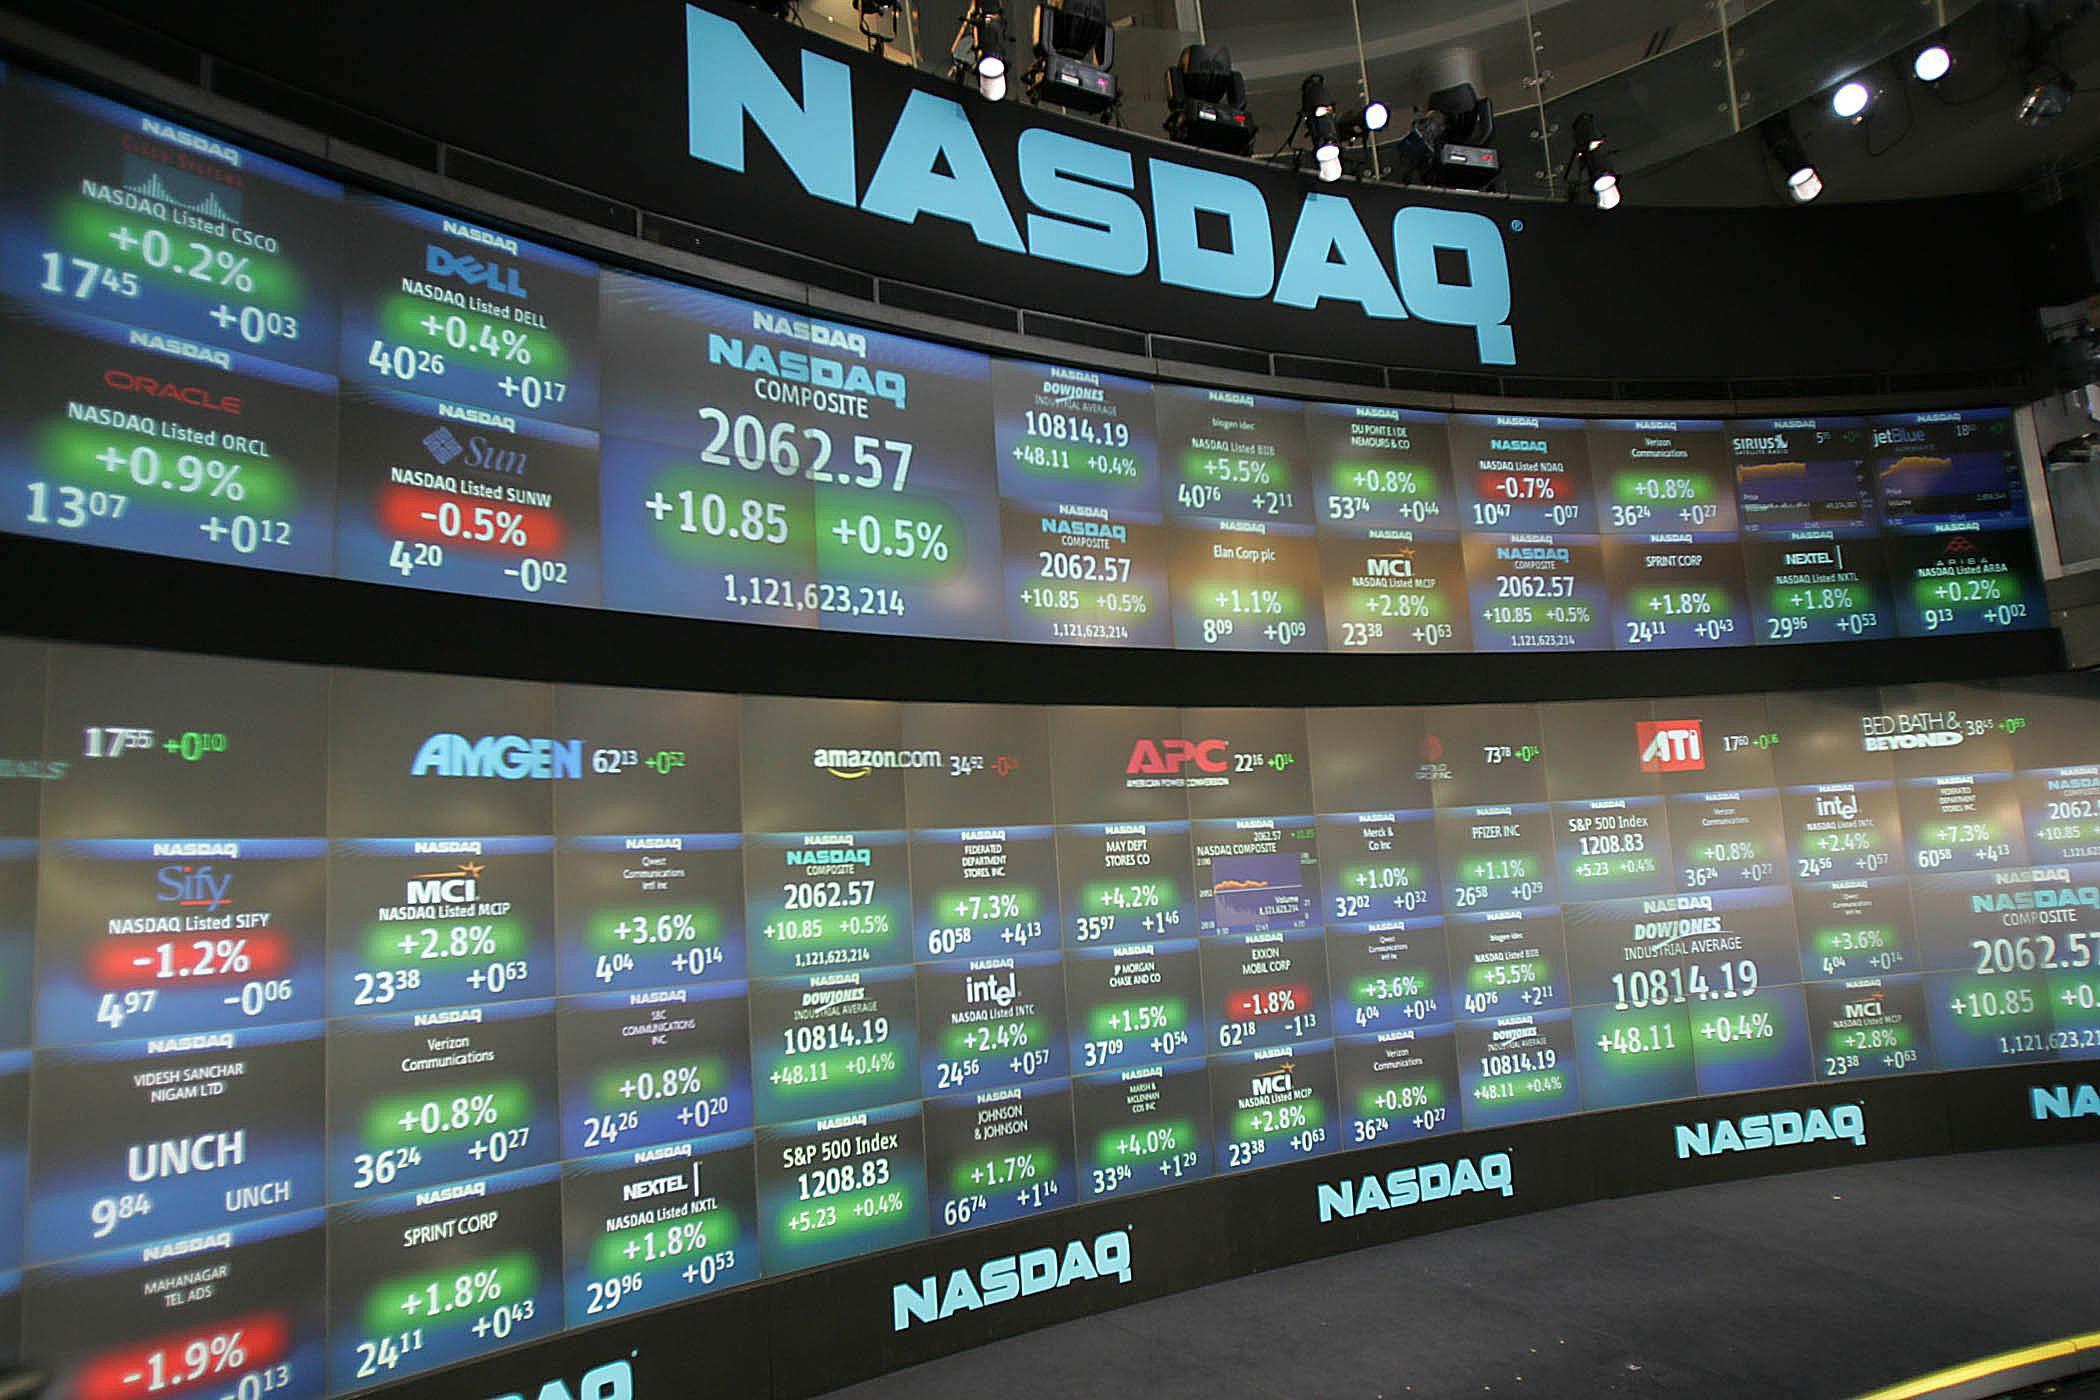 NASDAQ(ナスダック) SBIバーチャル・カレンシーズ(SBIVC)